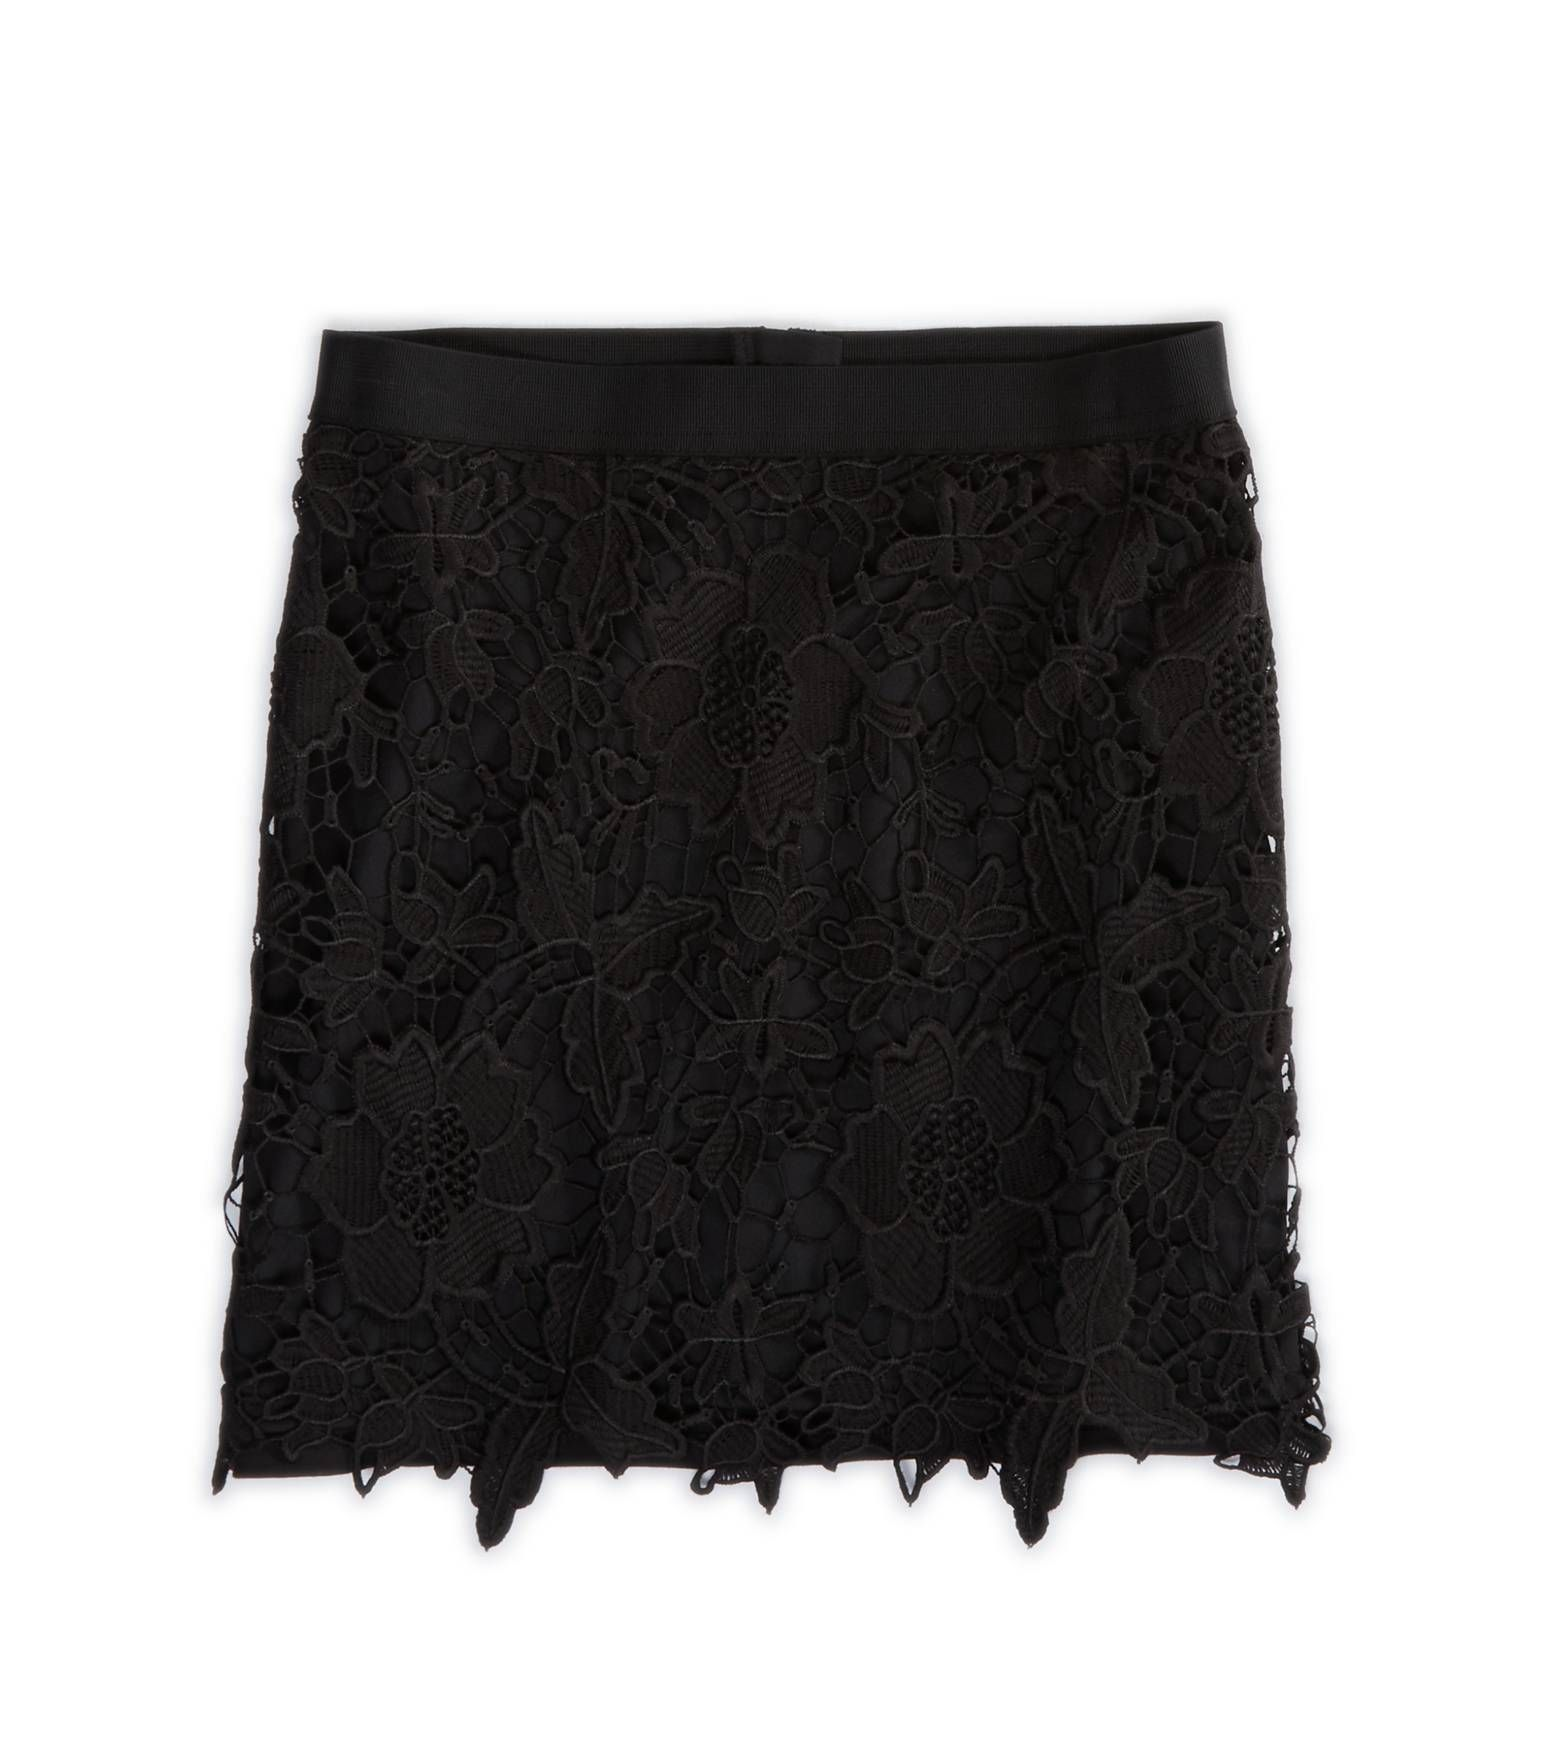 Black · Black lace overlay mini skirt